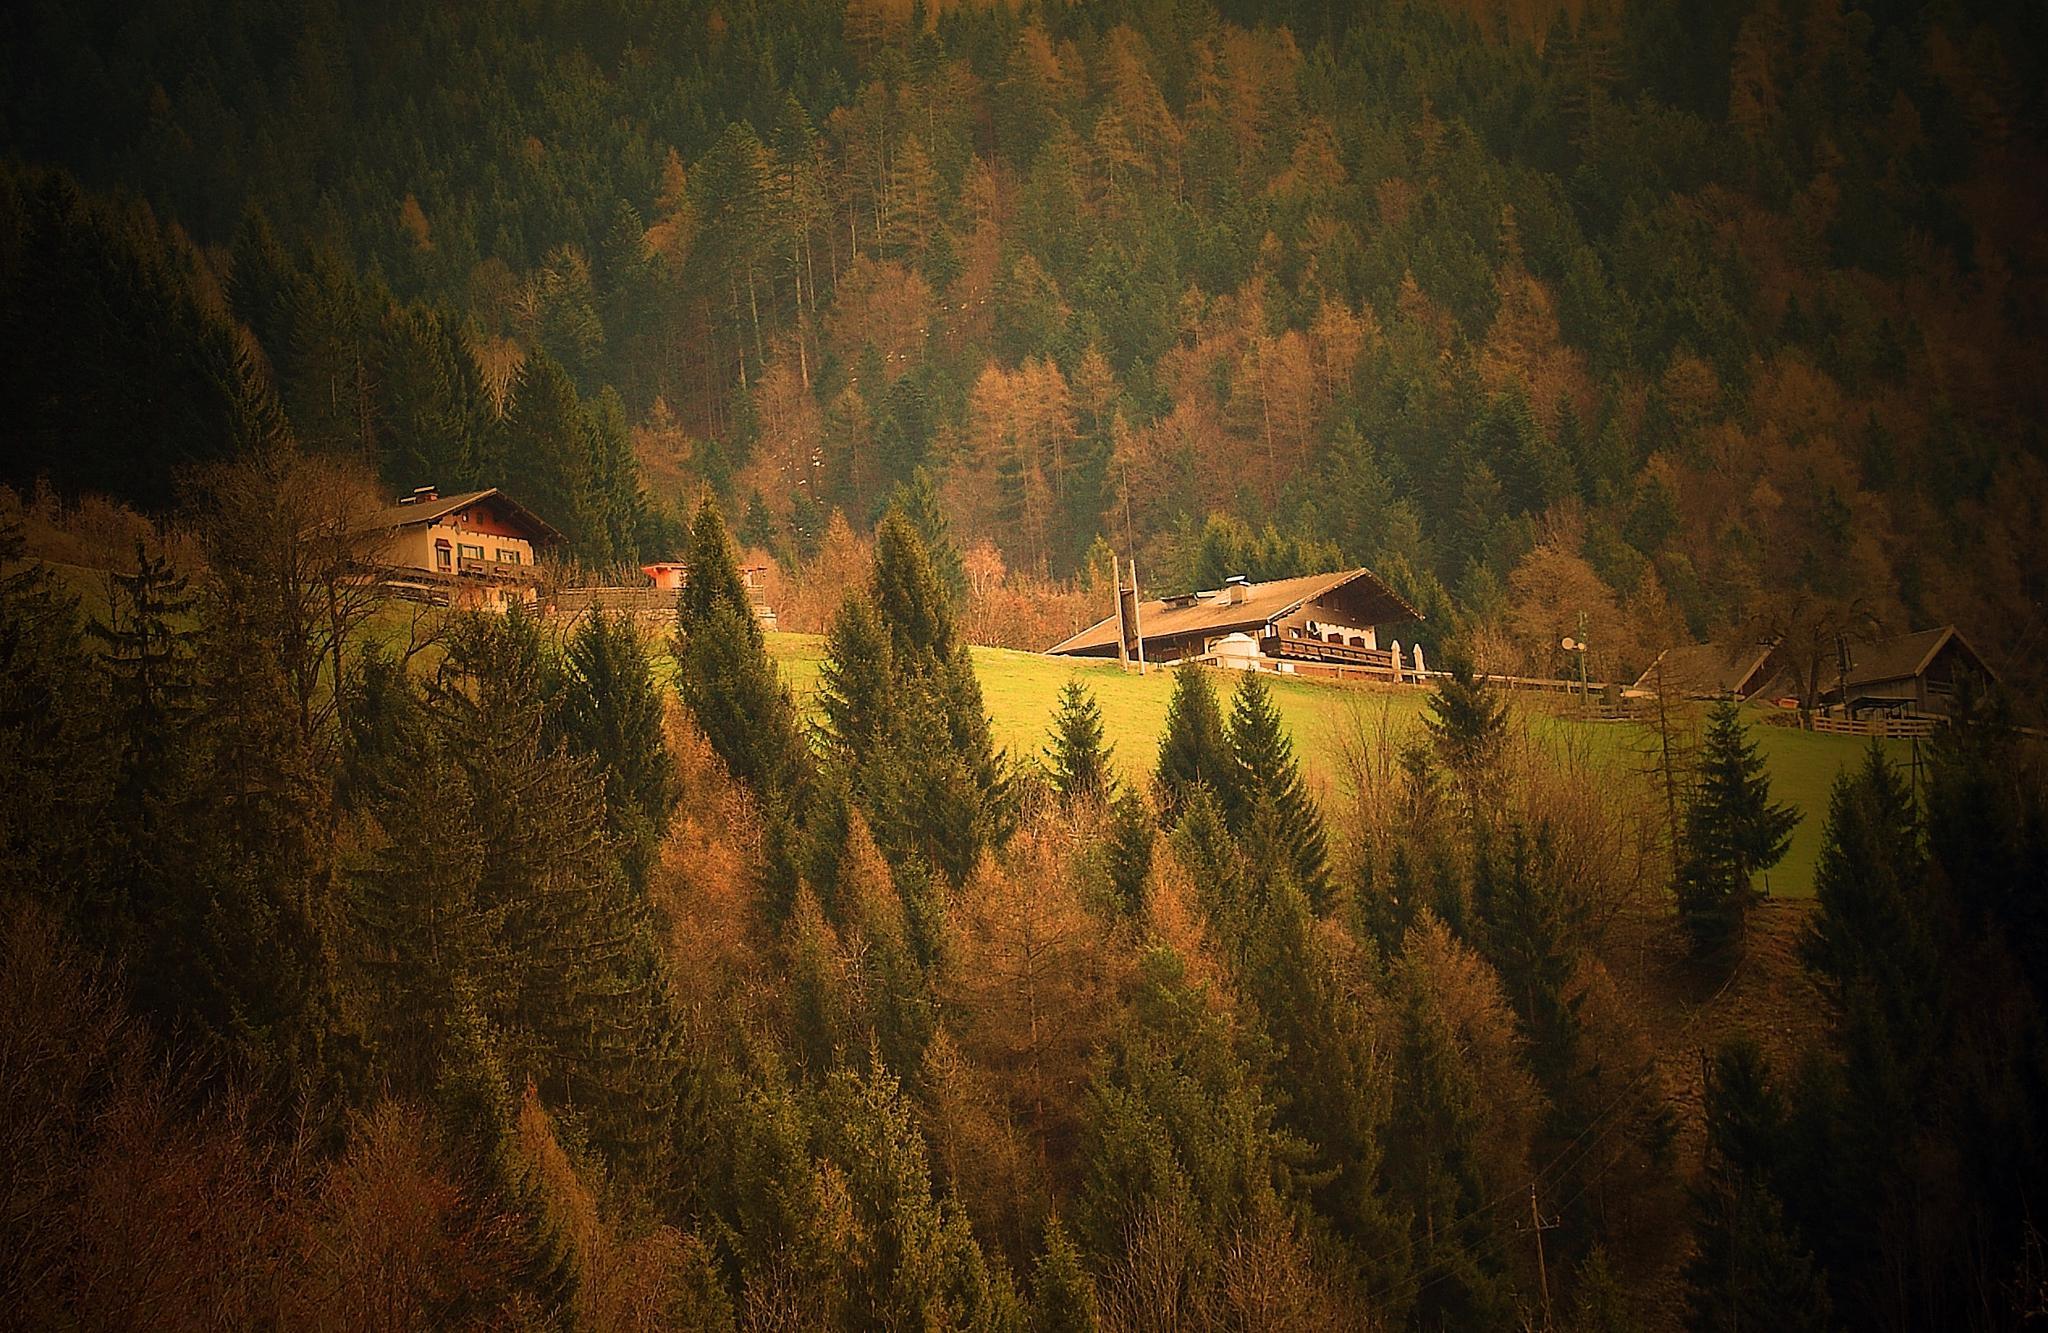 Austria by mimicahalkijevic